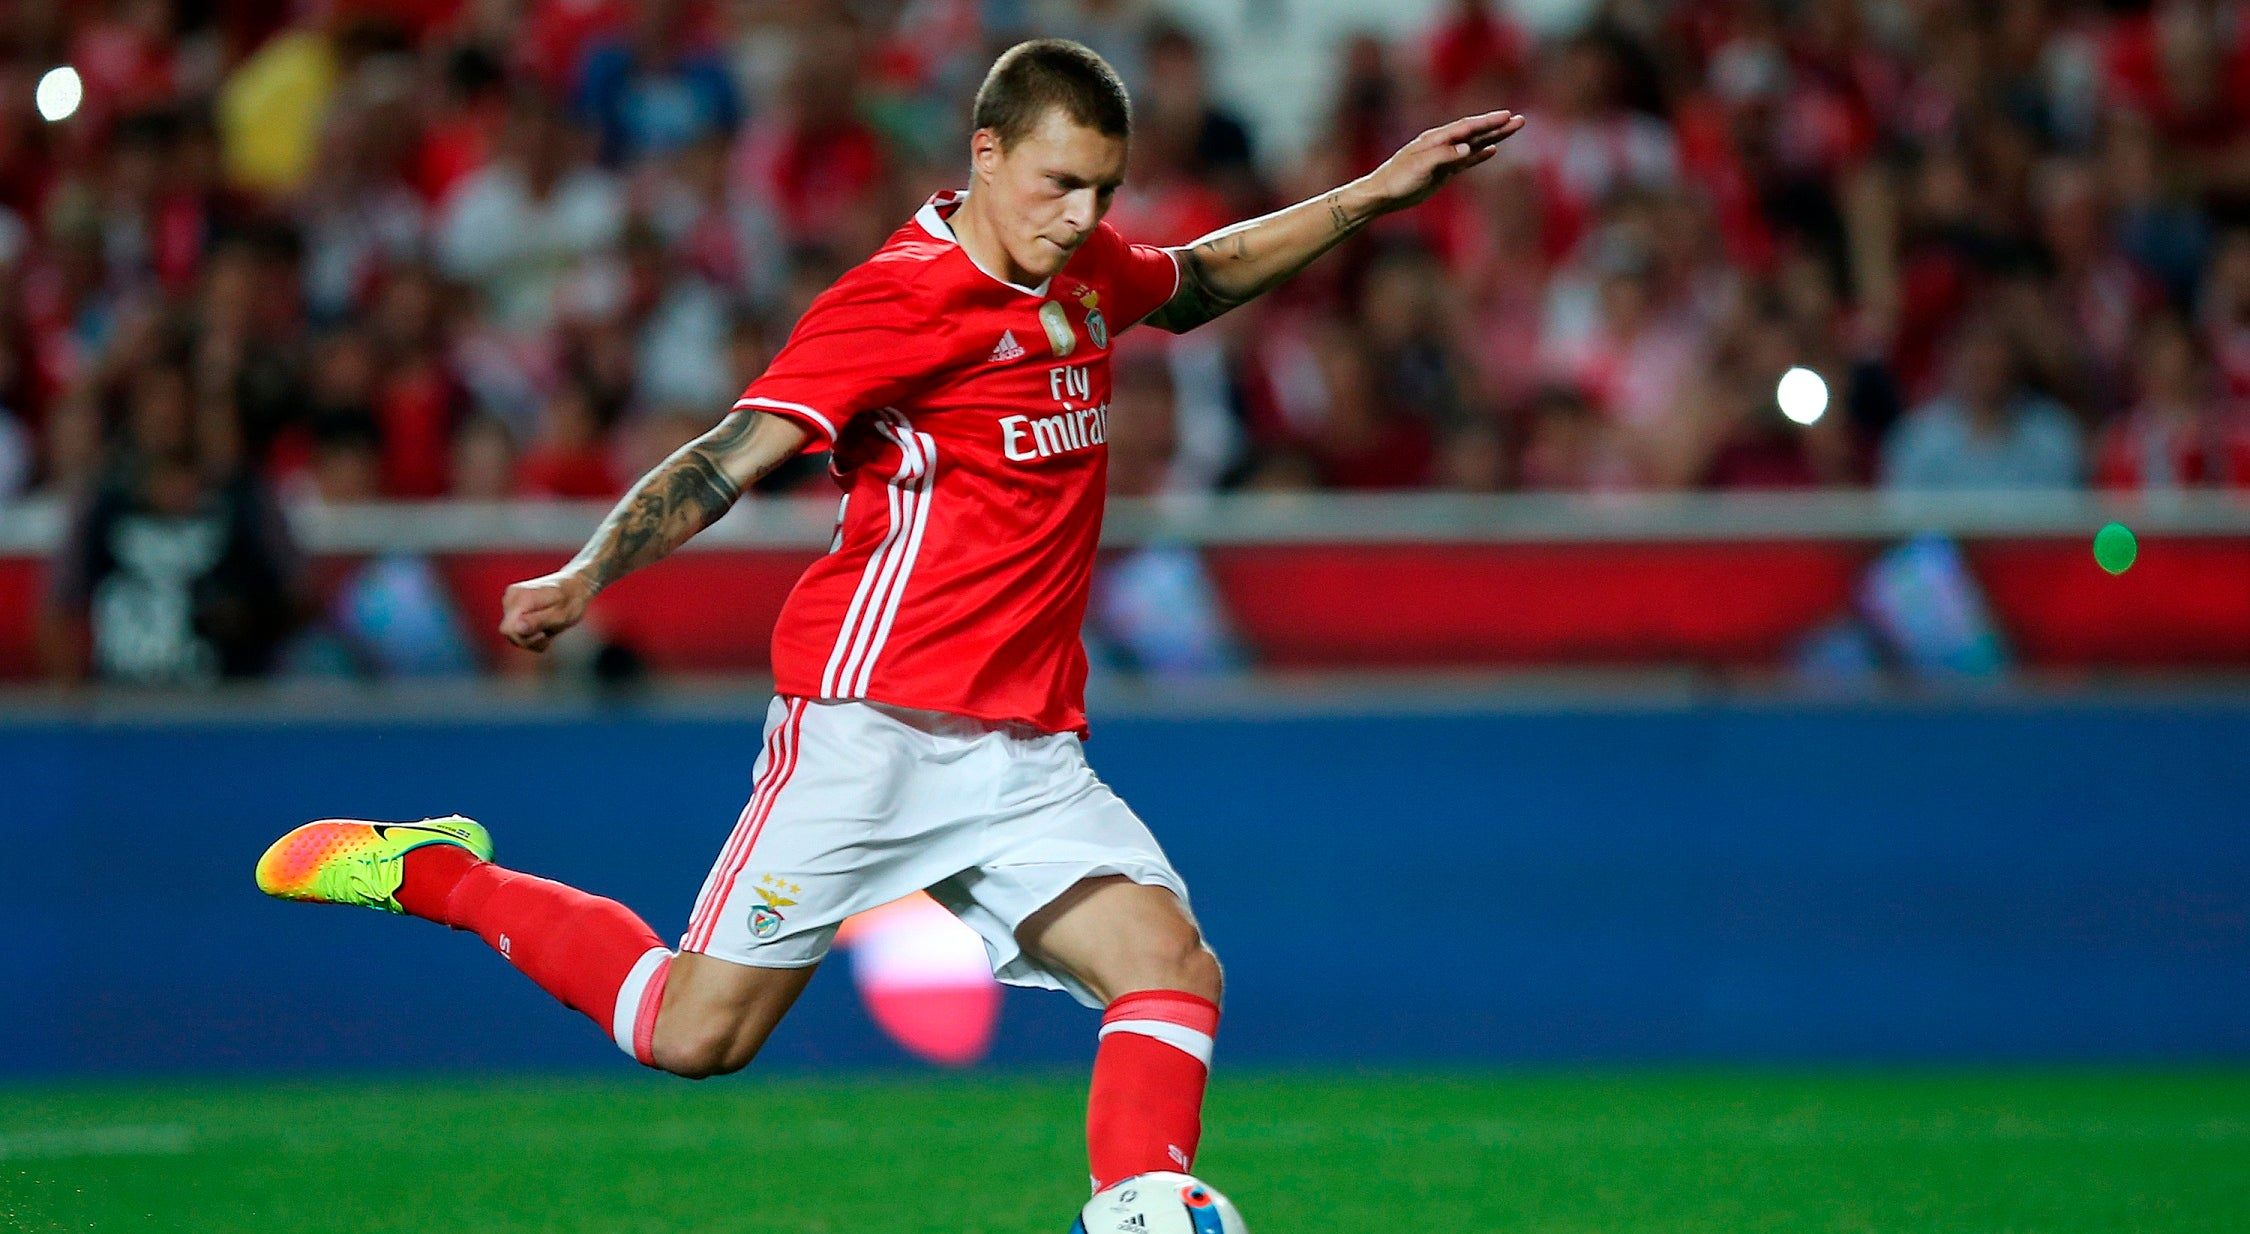 Sodestrom aconselha Lindelof a ficar no Benfica